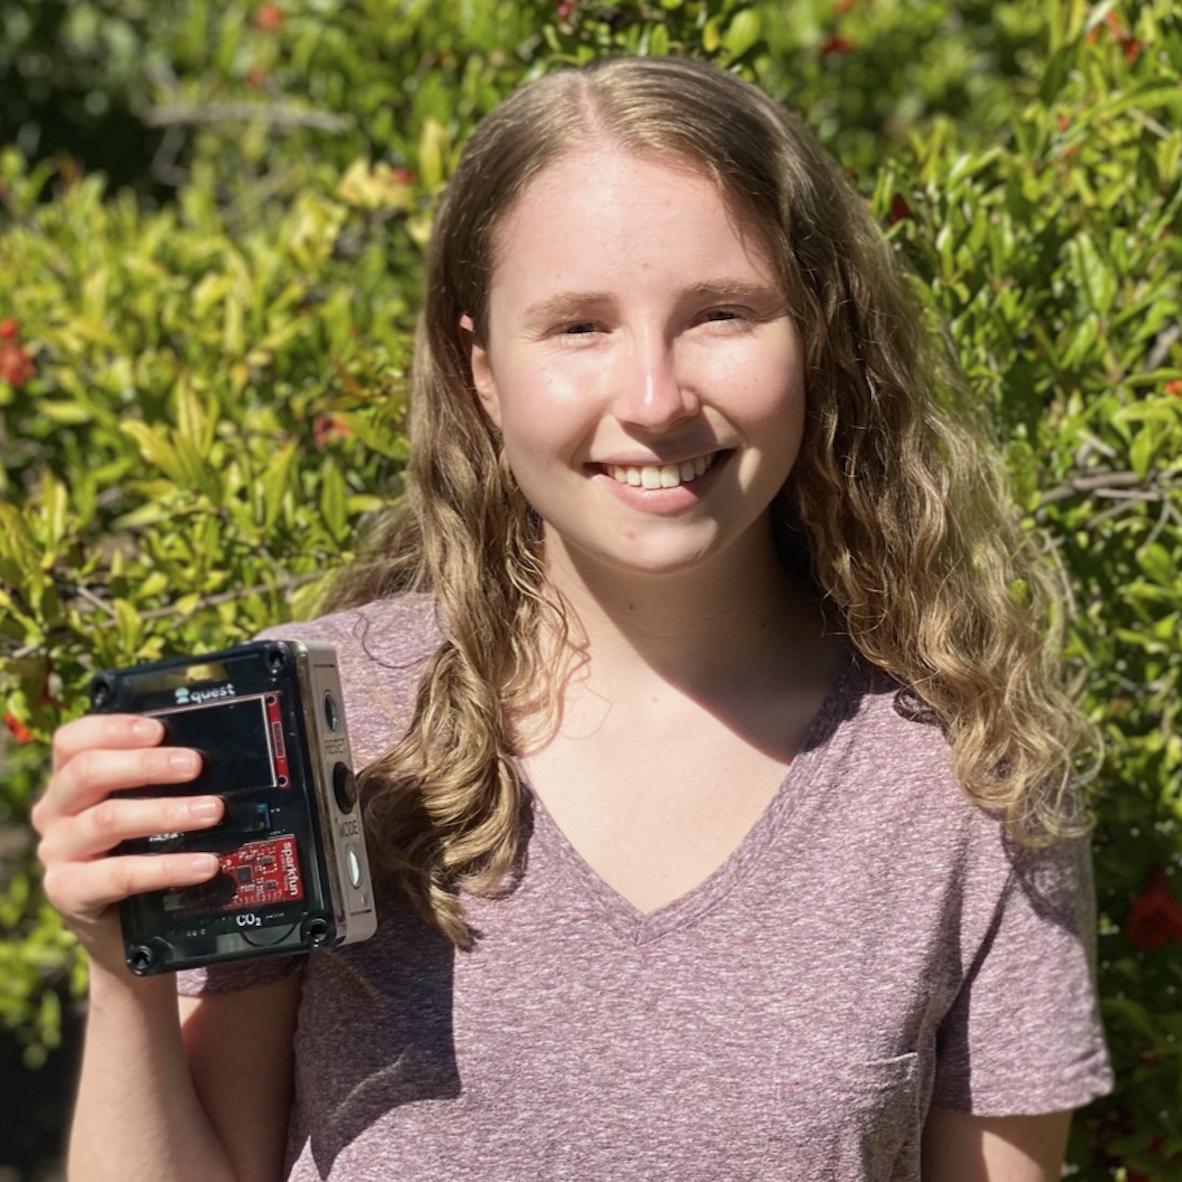 Erica holding the Quest CO2 sensor module